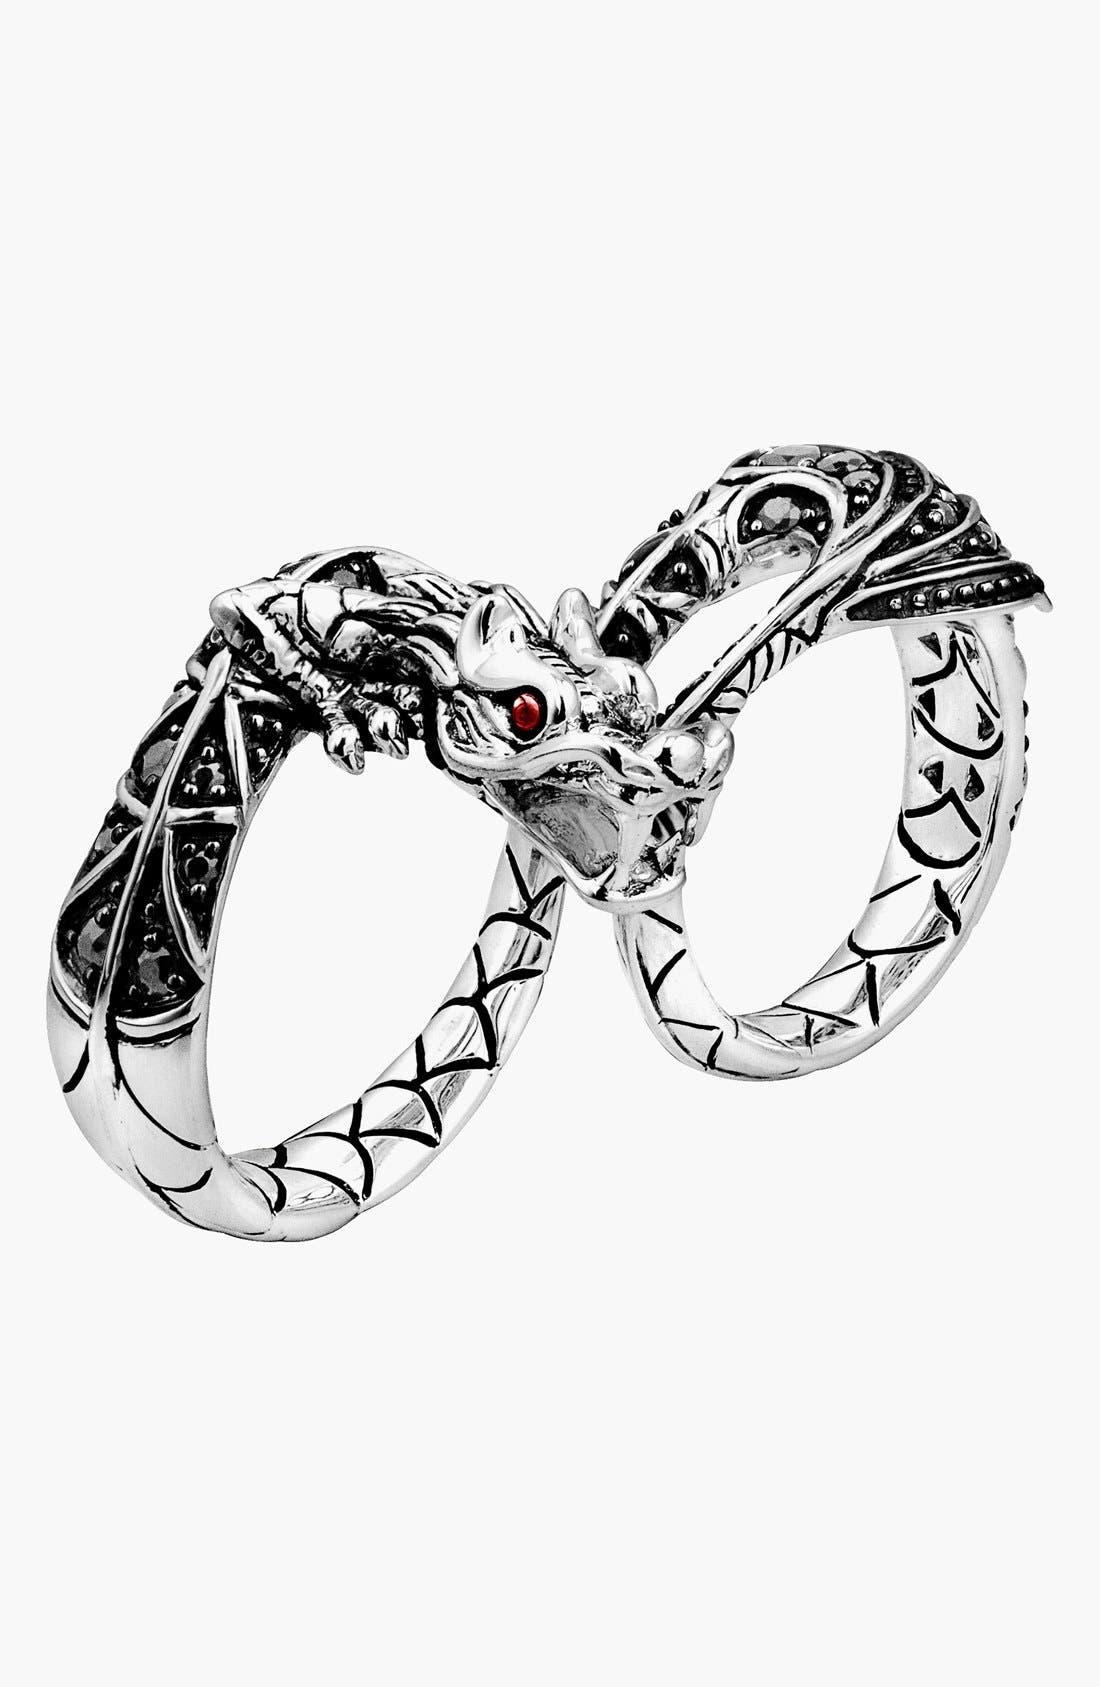 Main Image - John Hardy 'Naga - Lava' Dragon Two-Finger Ring